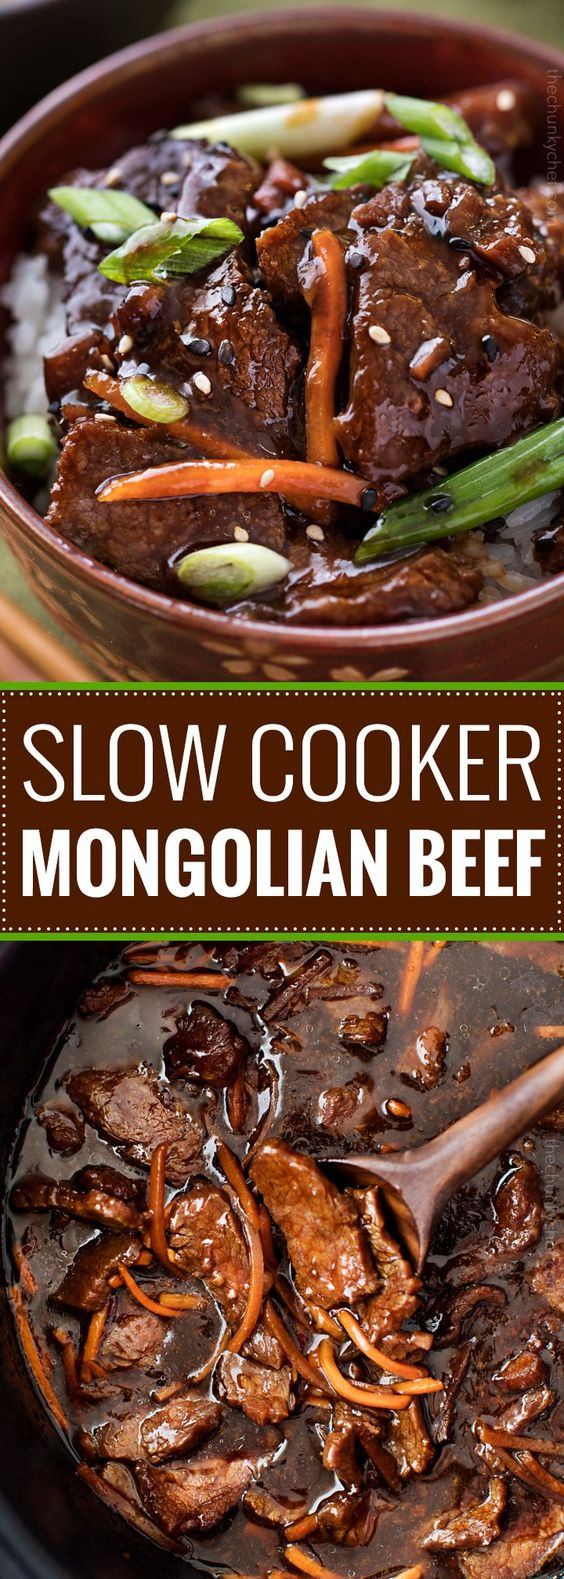 EASY SLOW COOKER MONGOLIAN BEEF RECIPE